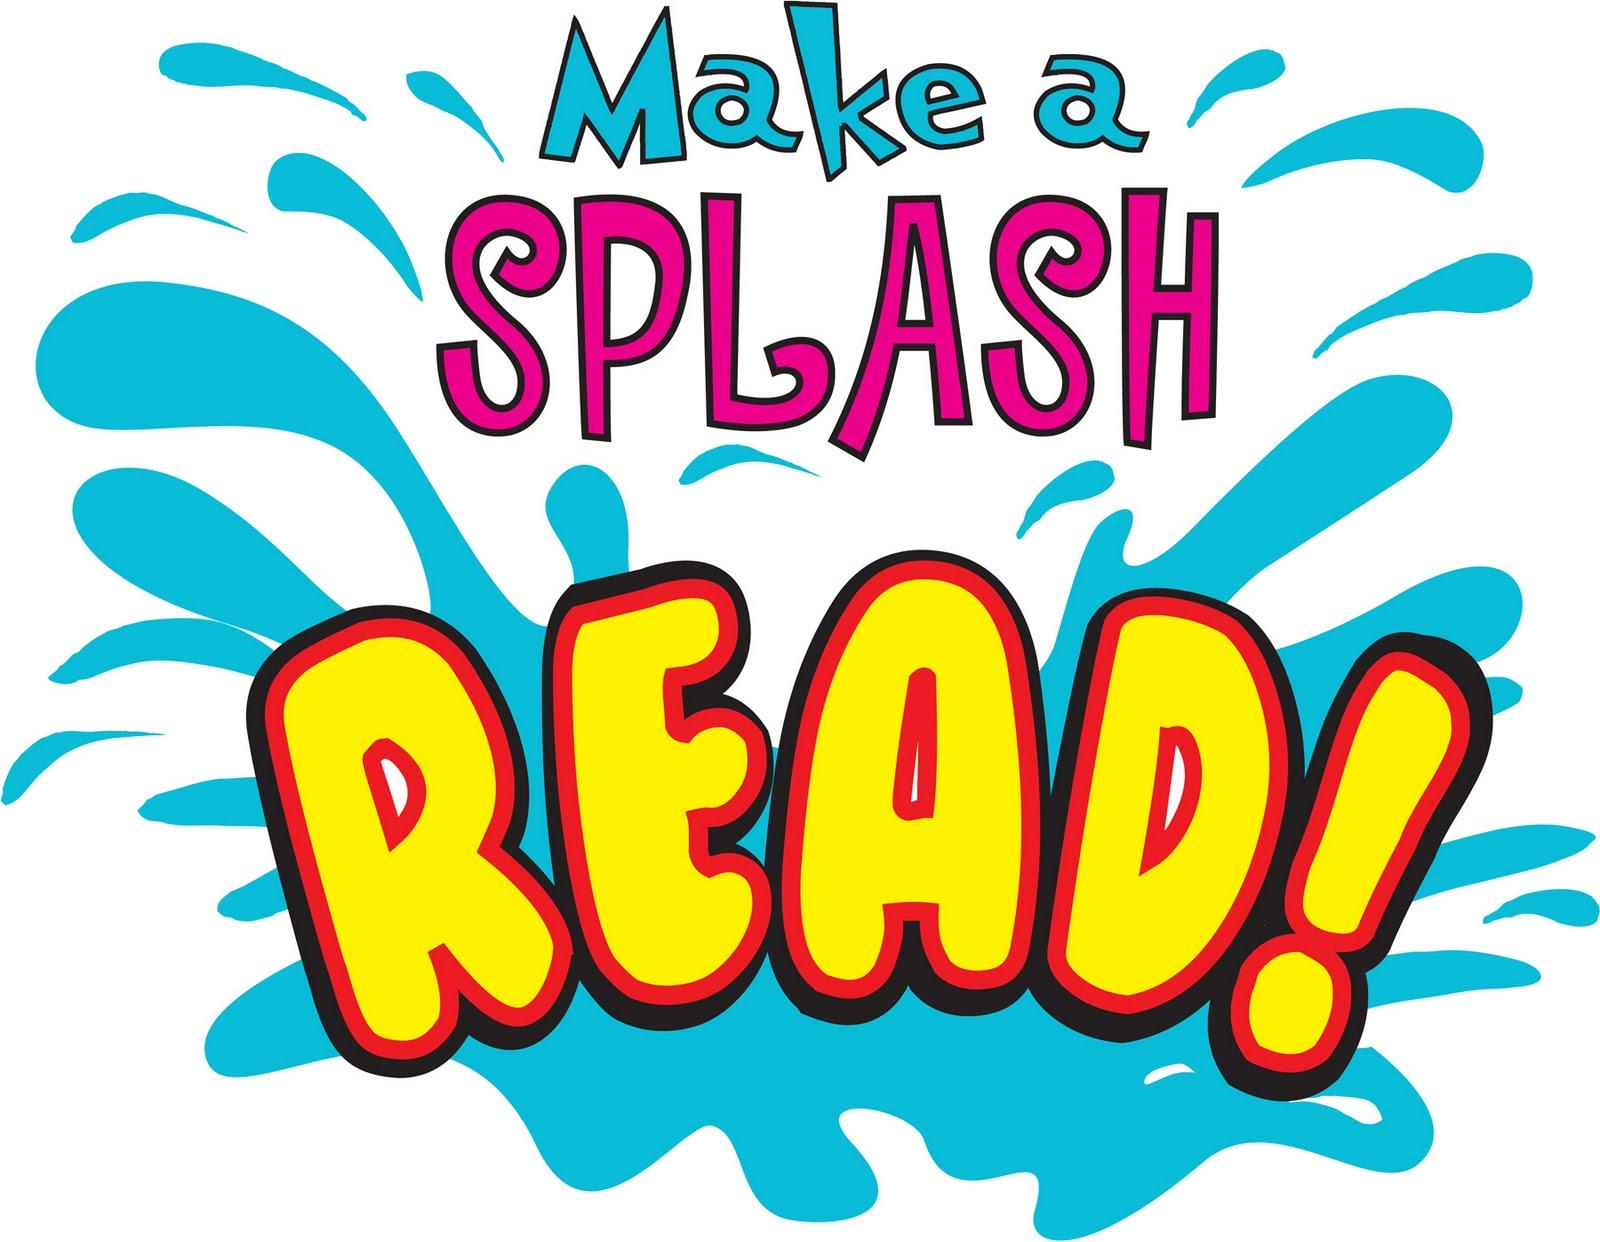 alliance public library blog summer reading is here rh allpublib blogspot com summer reading clipart black and white summer reading clipart 2016